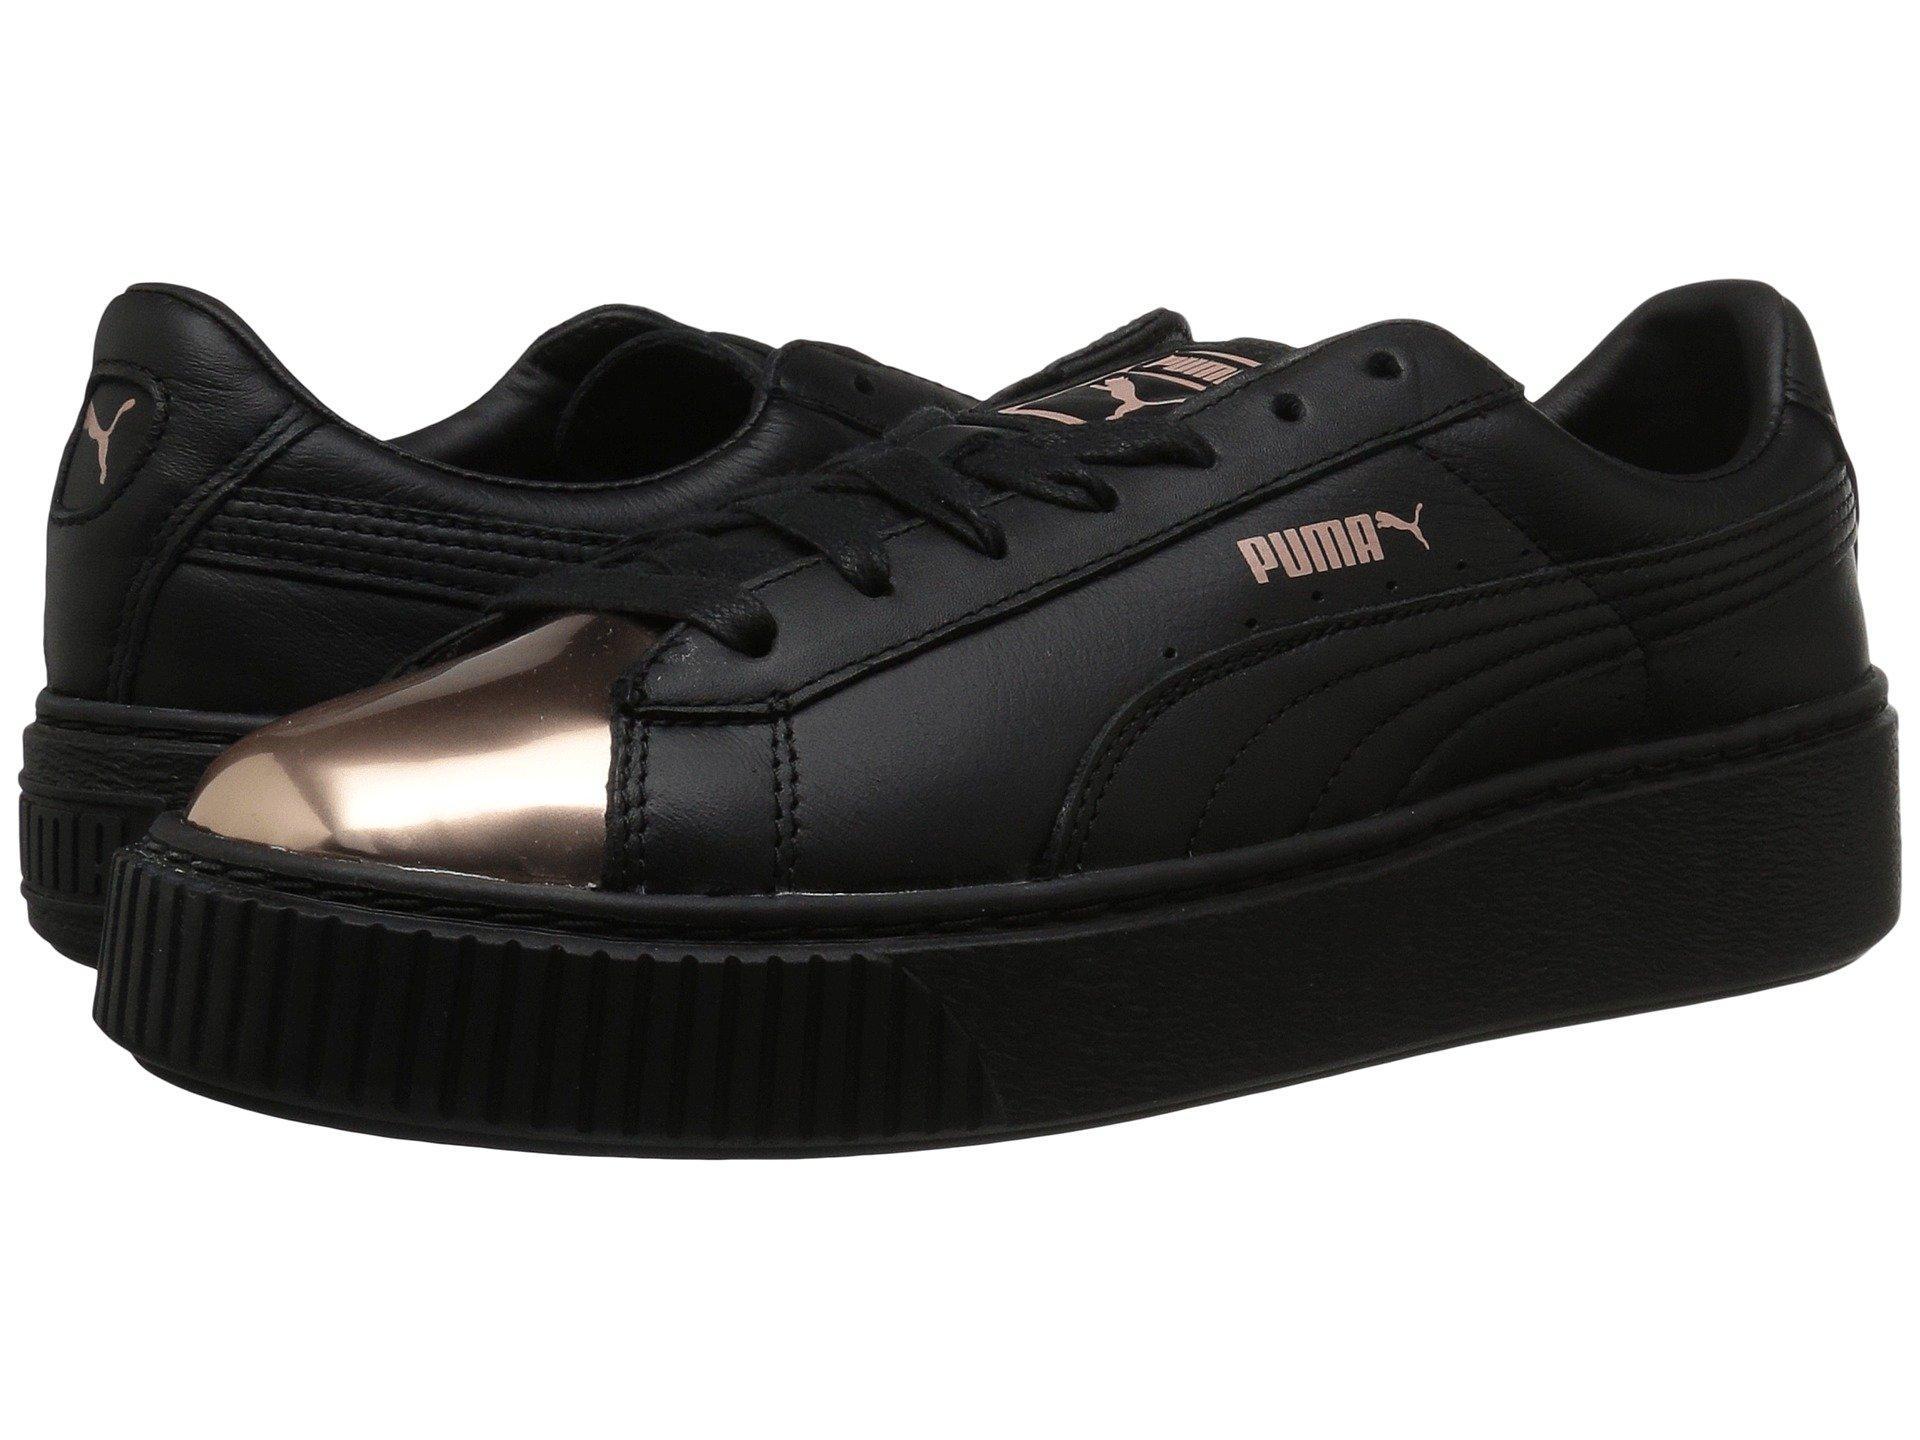 bd59794360bd Puma Leather Basket Platform Metallic Sneakers In Black Rose Gold ...